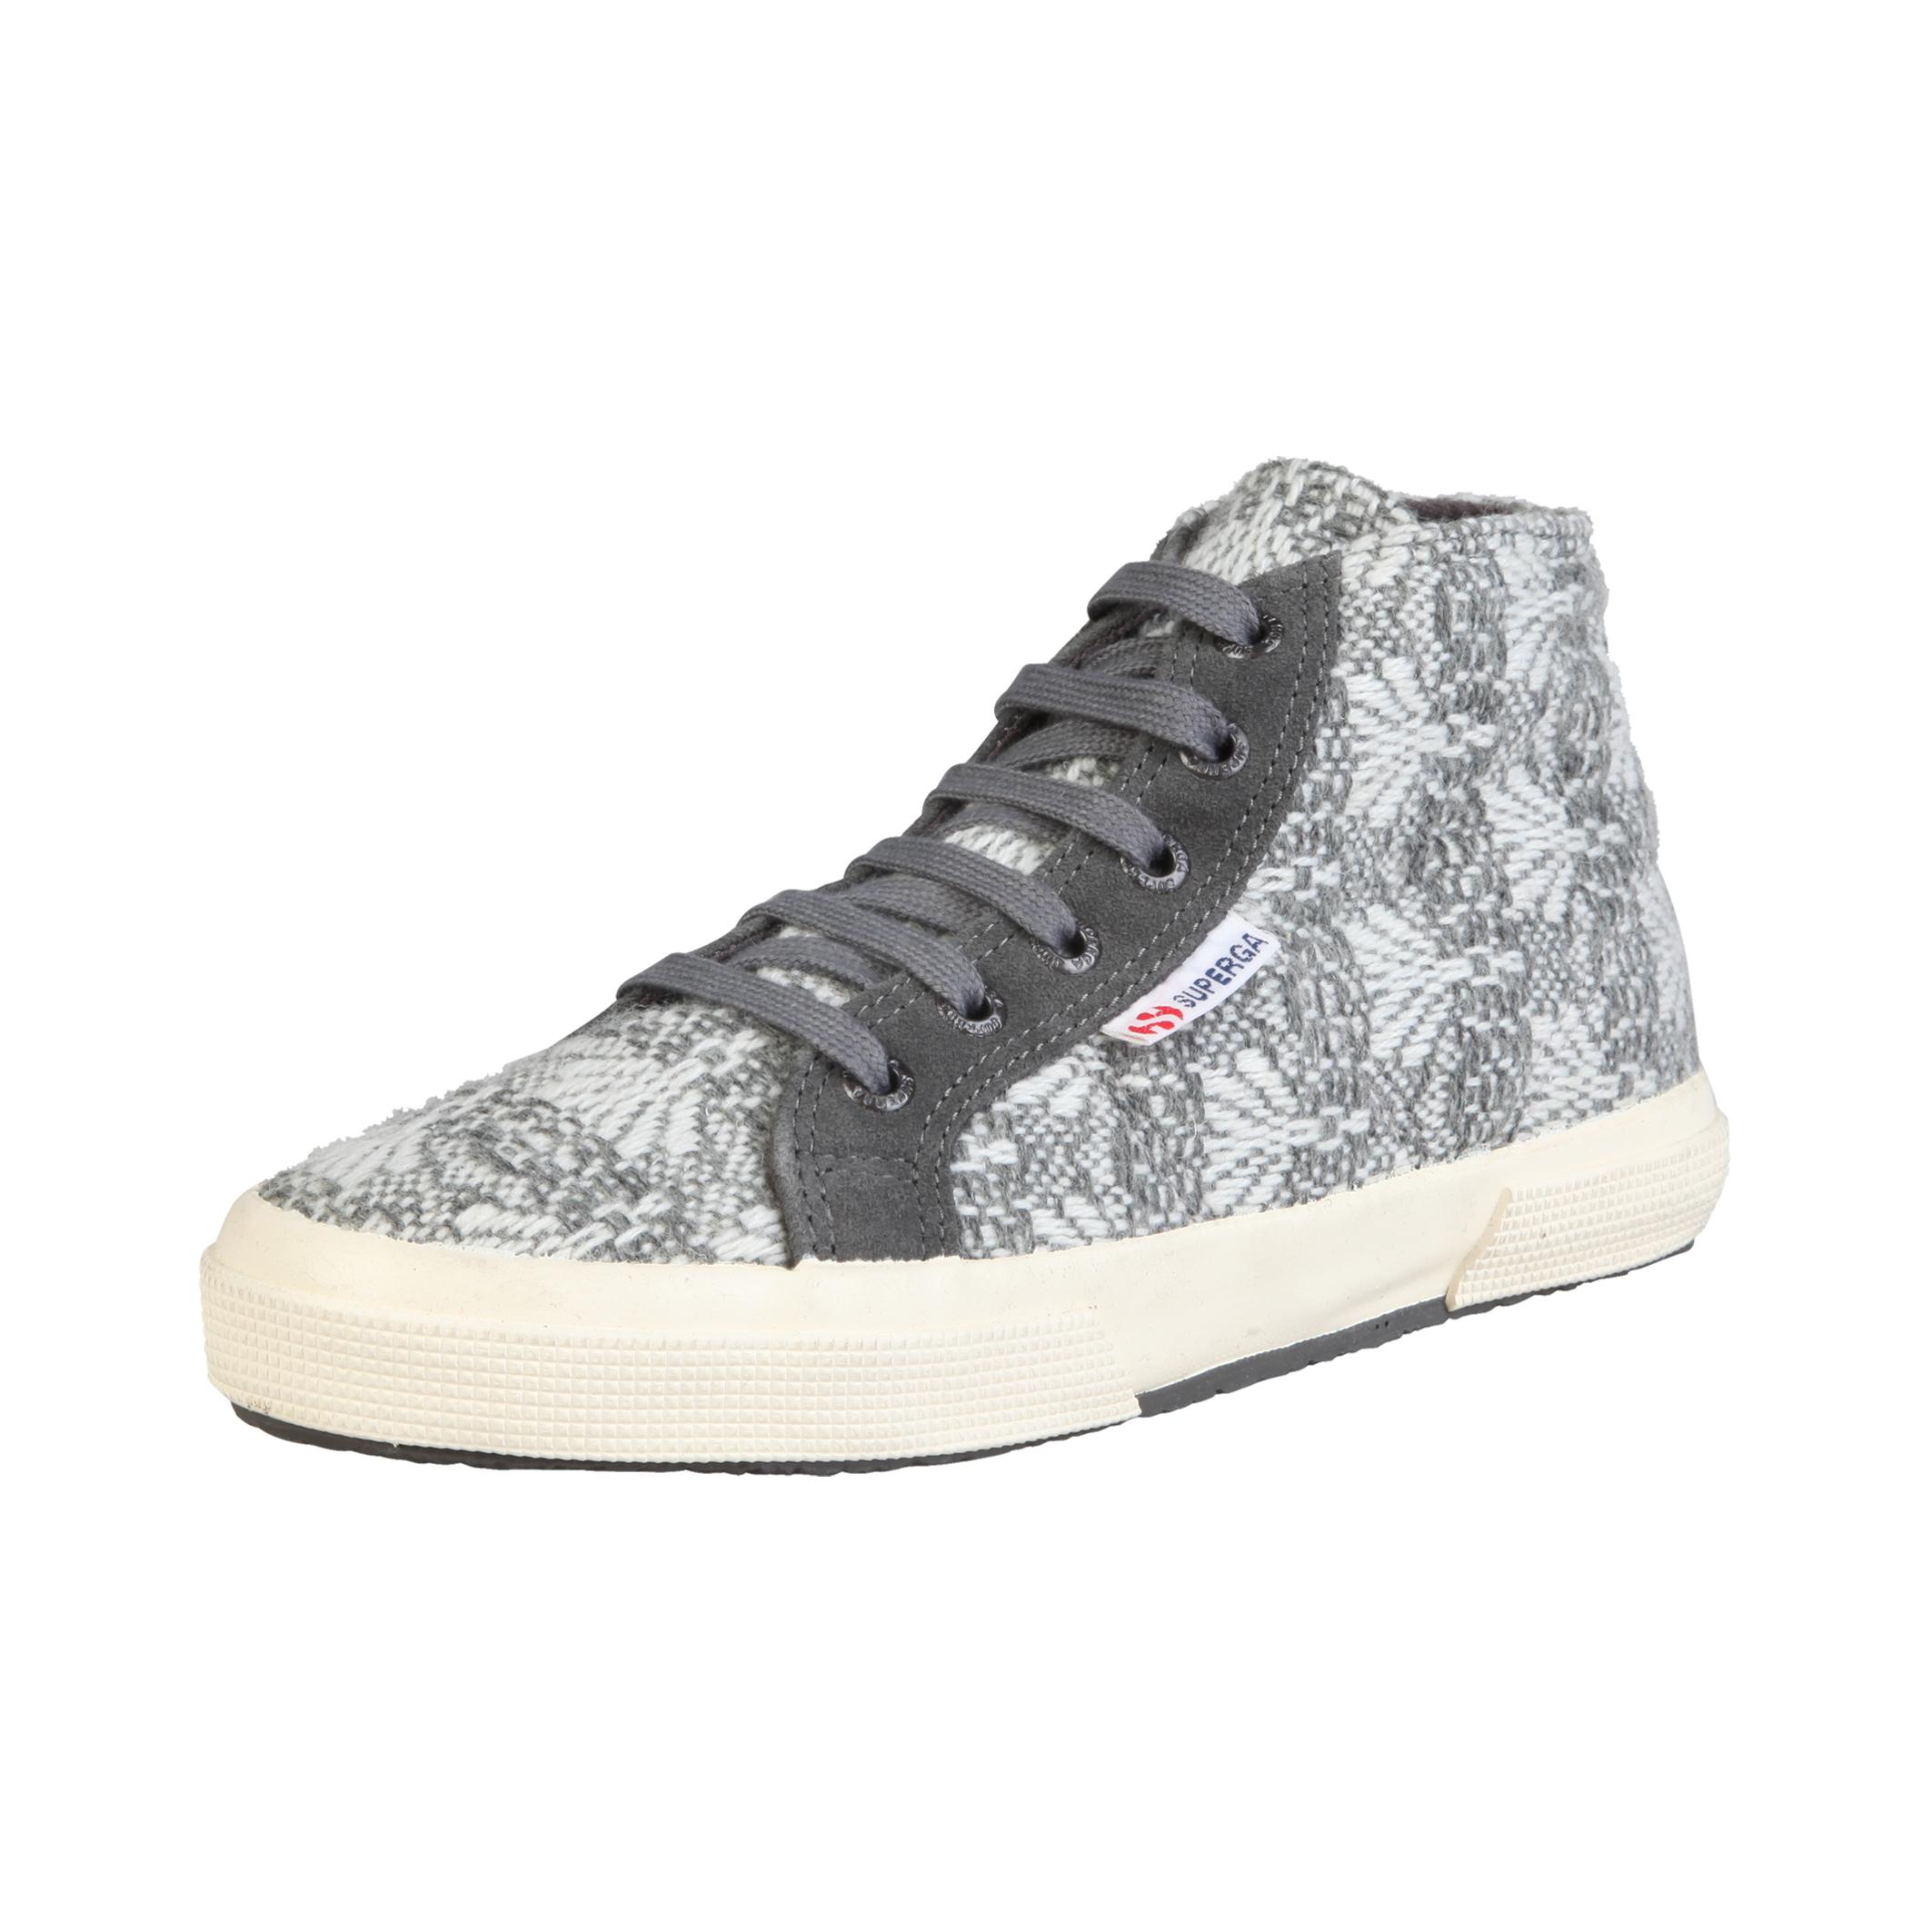 Chaussures   Superga S0072G0_2095 grey